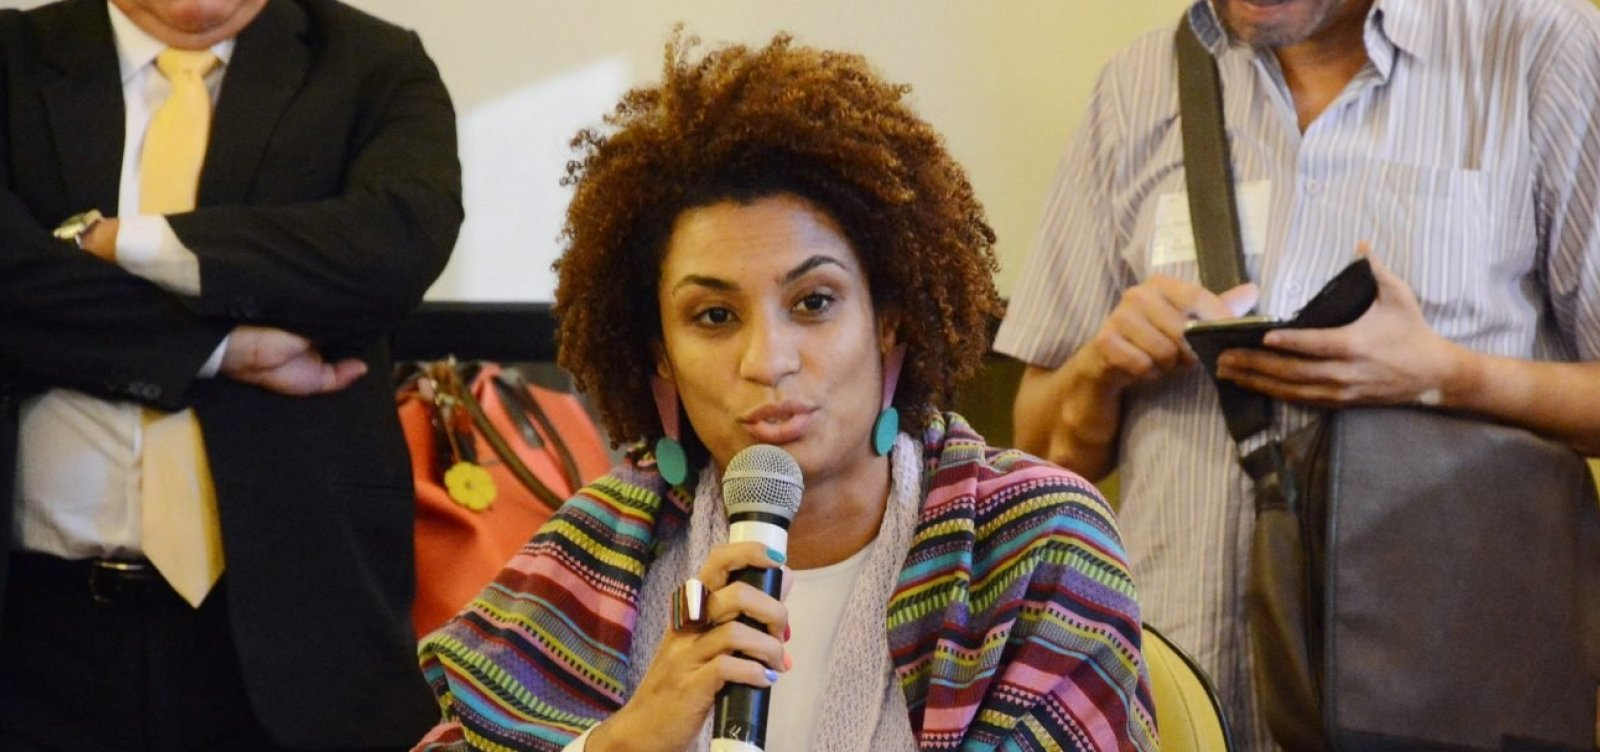 [MP diz ter identificado tipo físico de assassino de Marielle Franco]